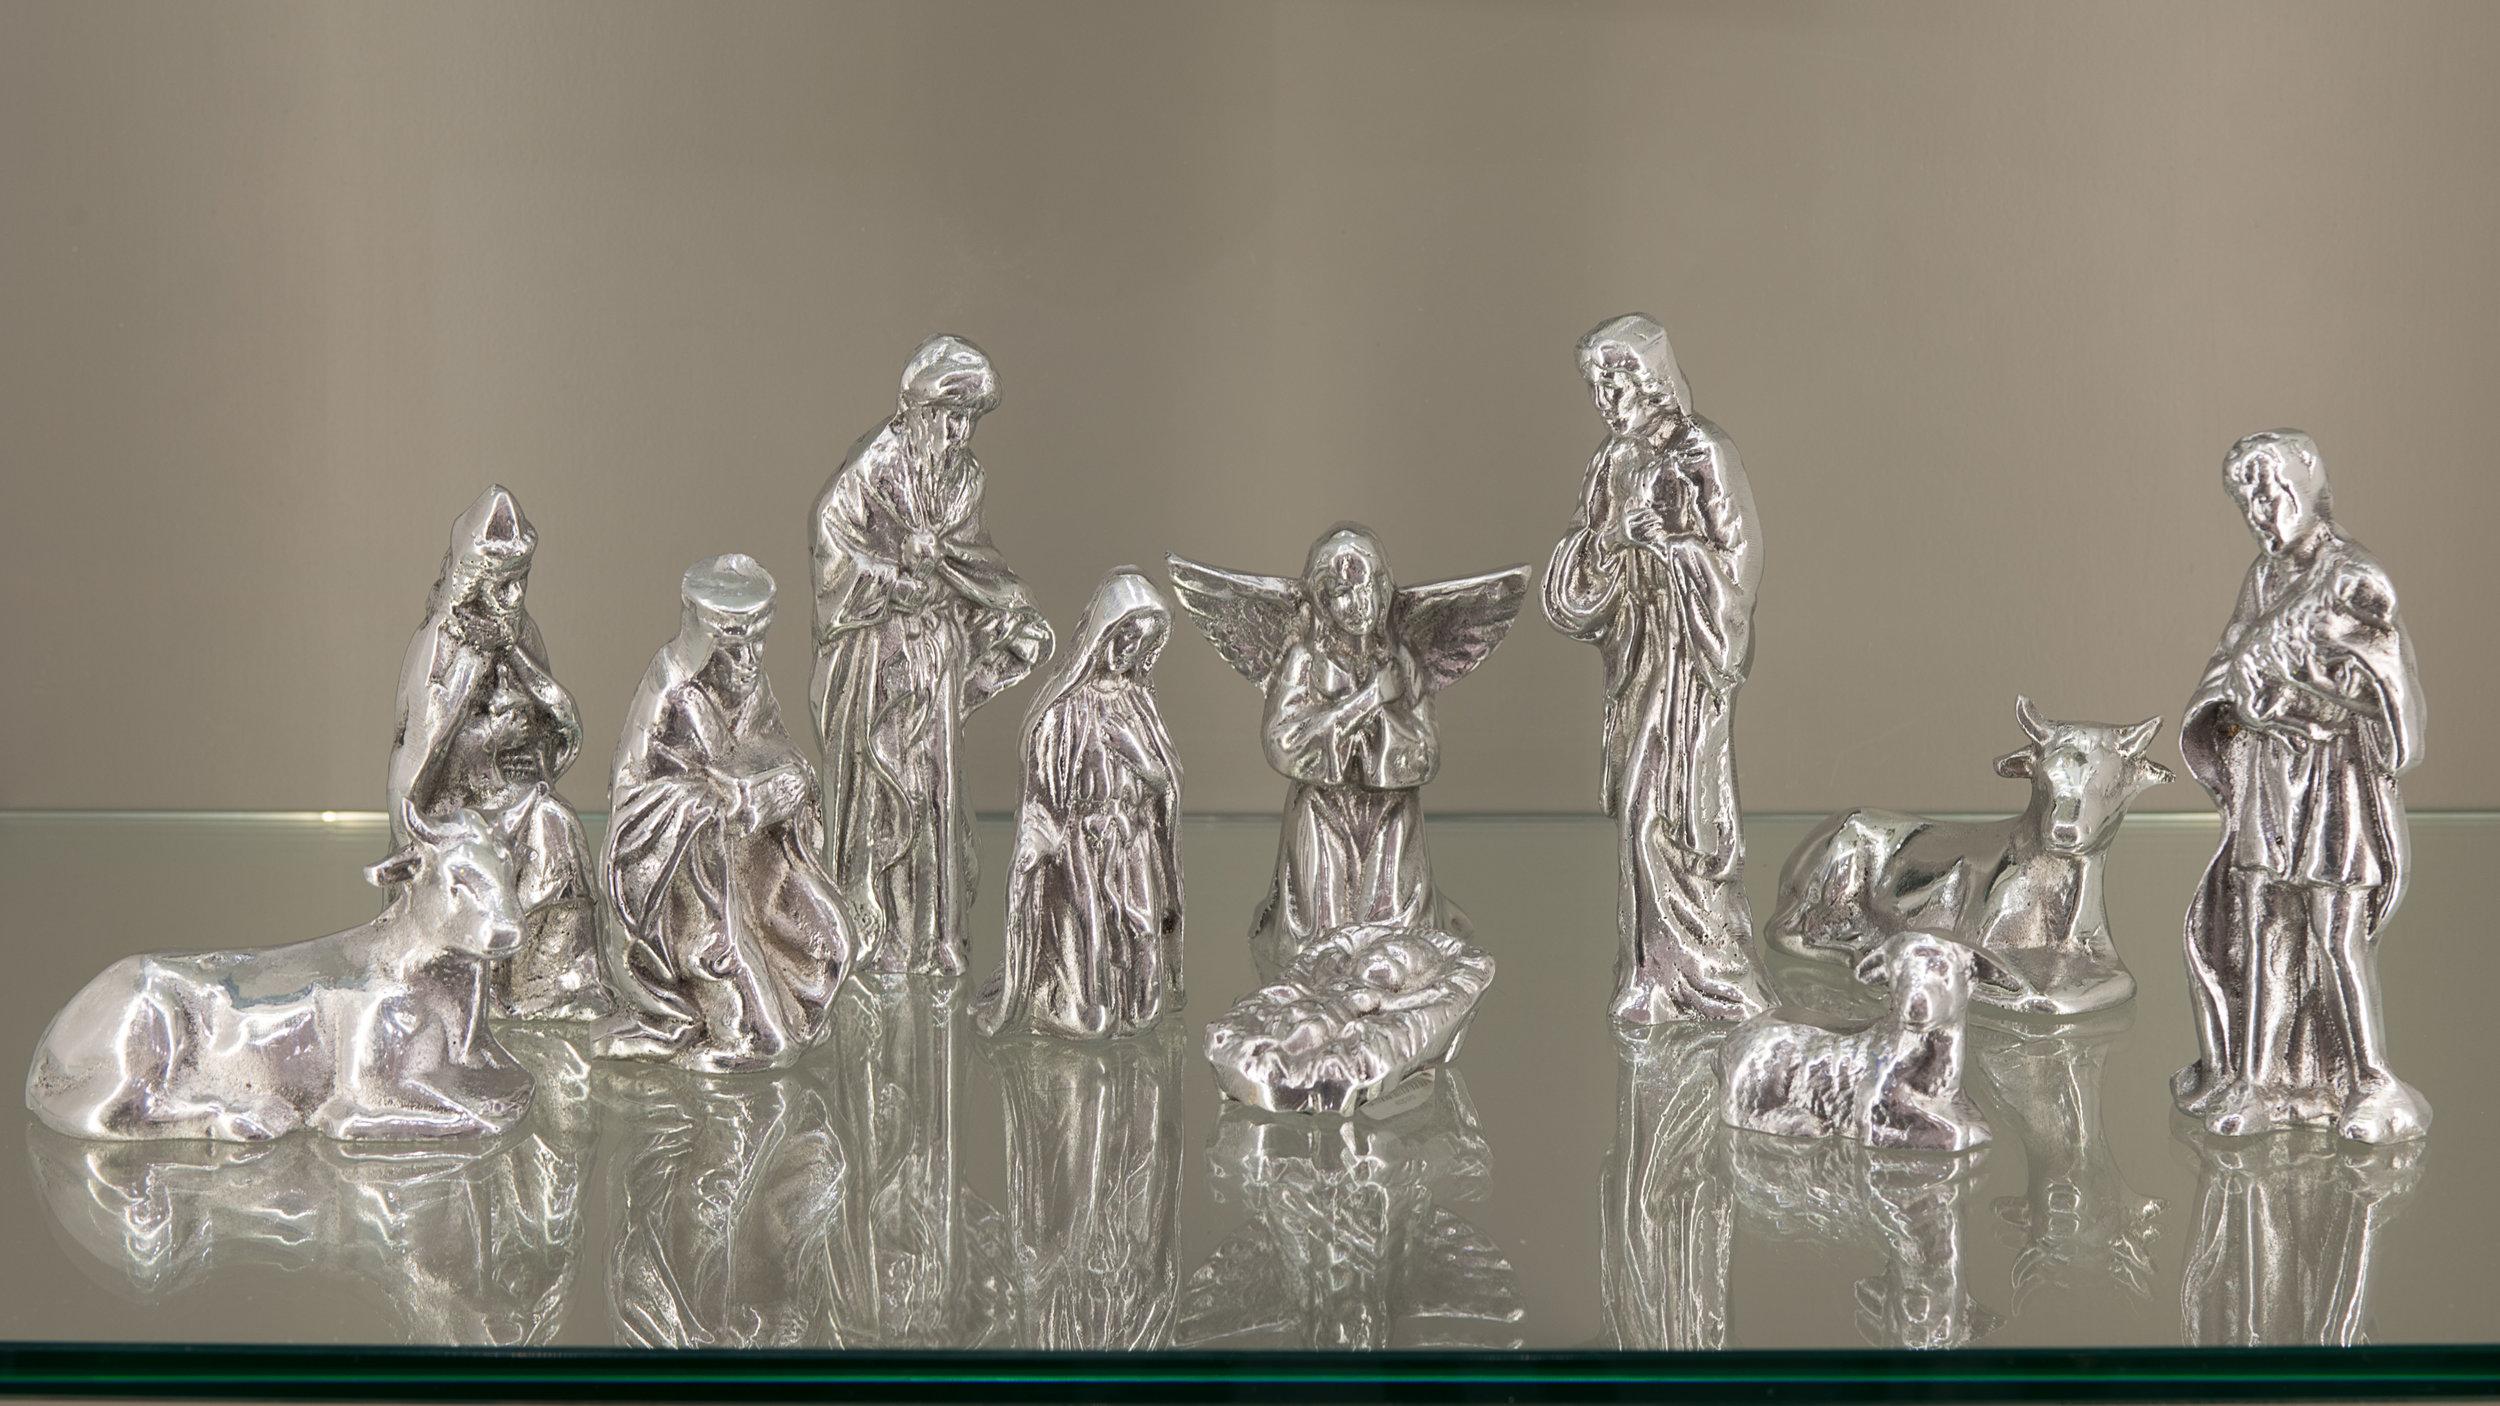 bachman-hand-smwe-silver-nativity.jpg